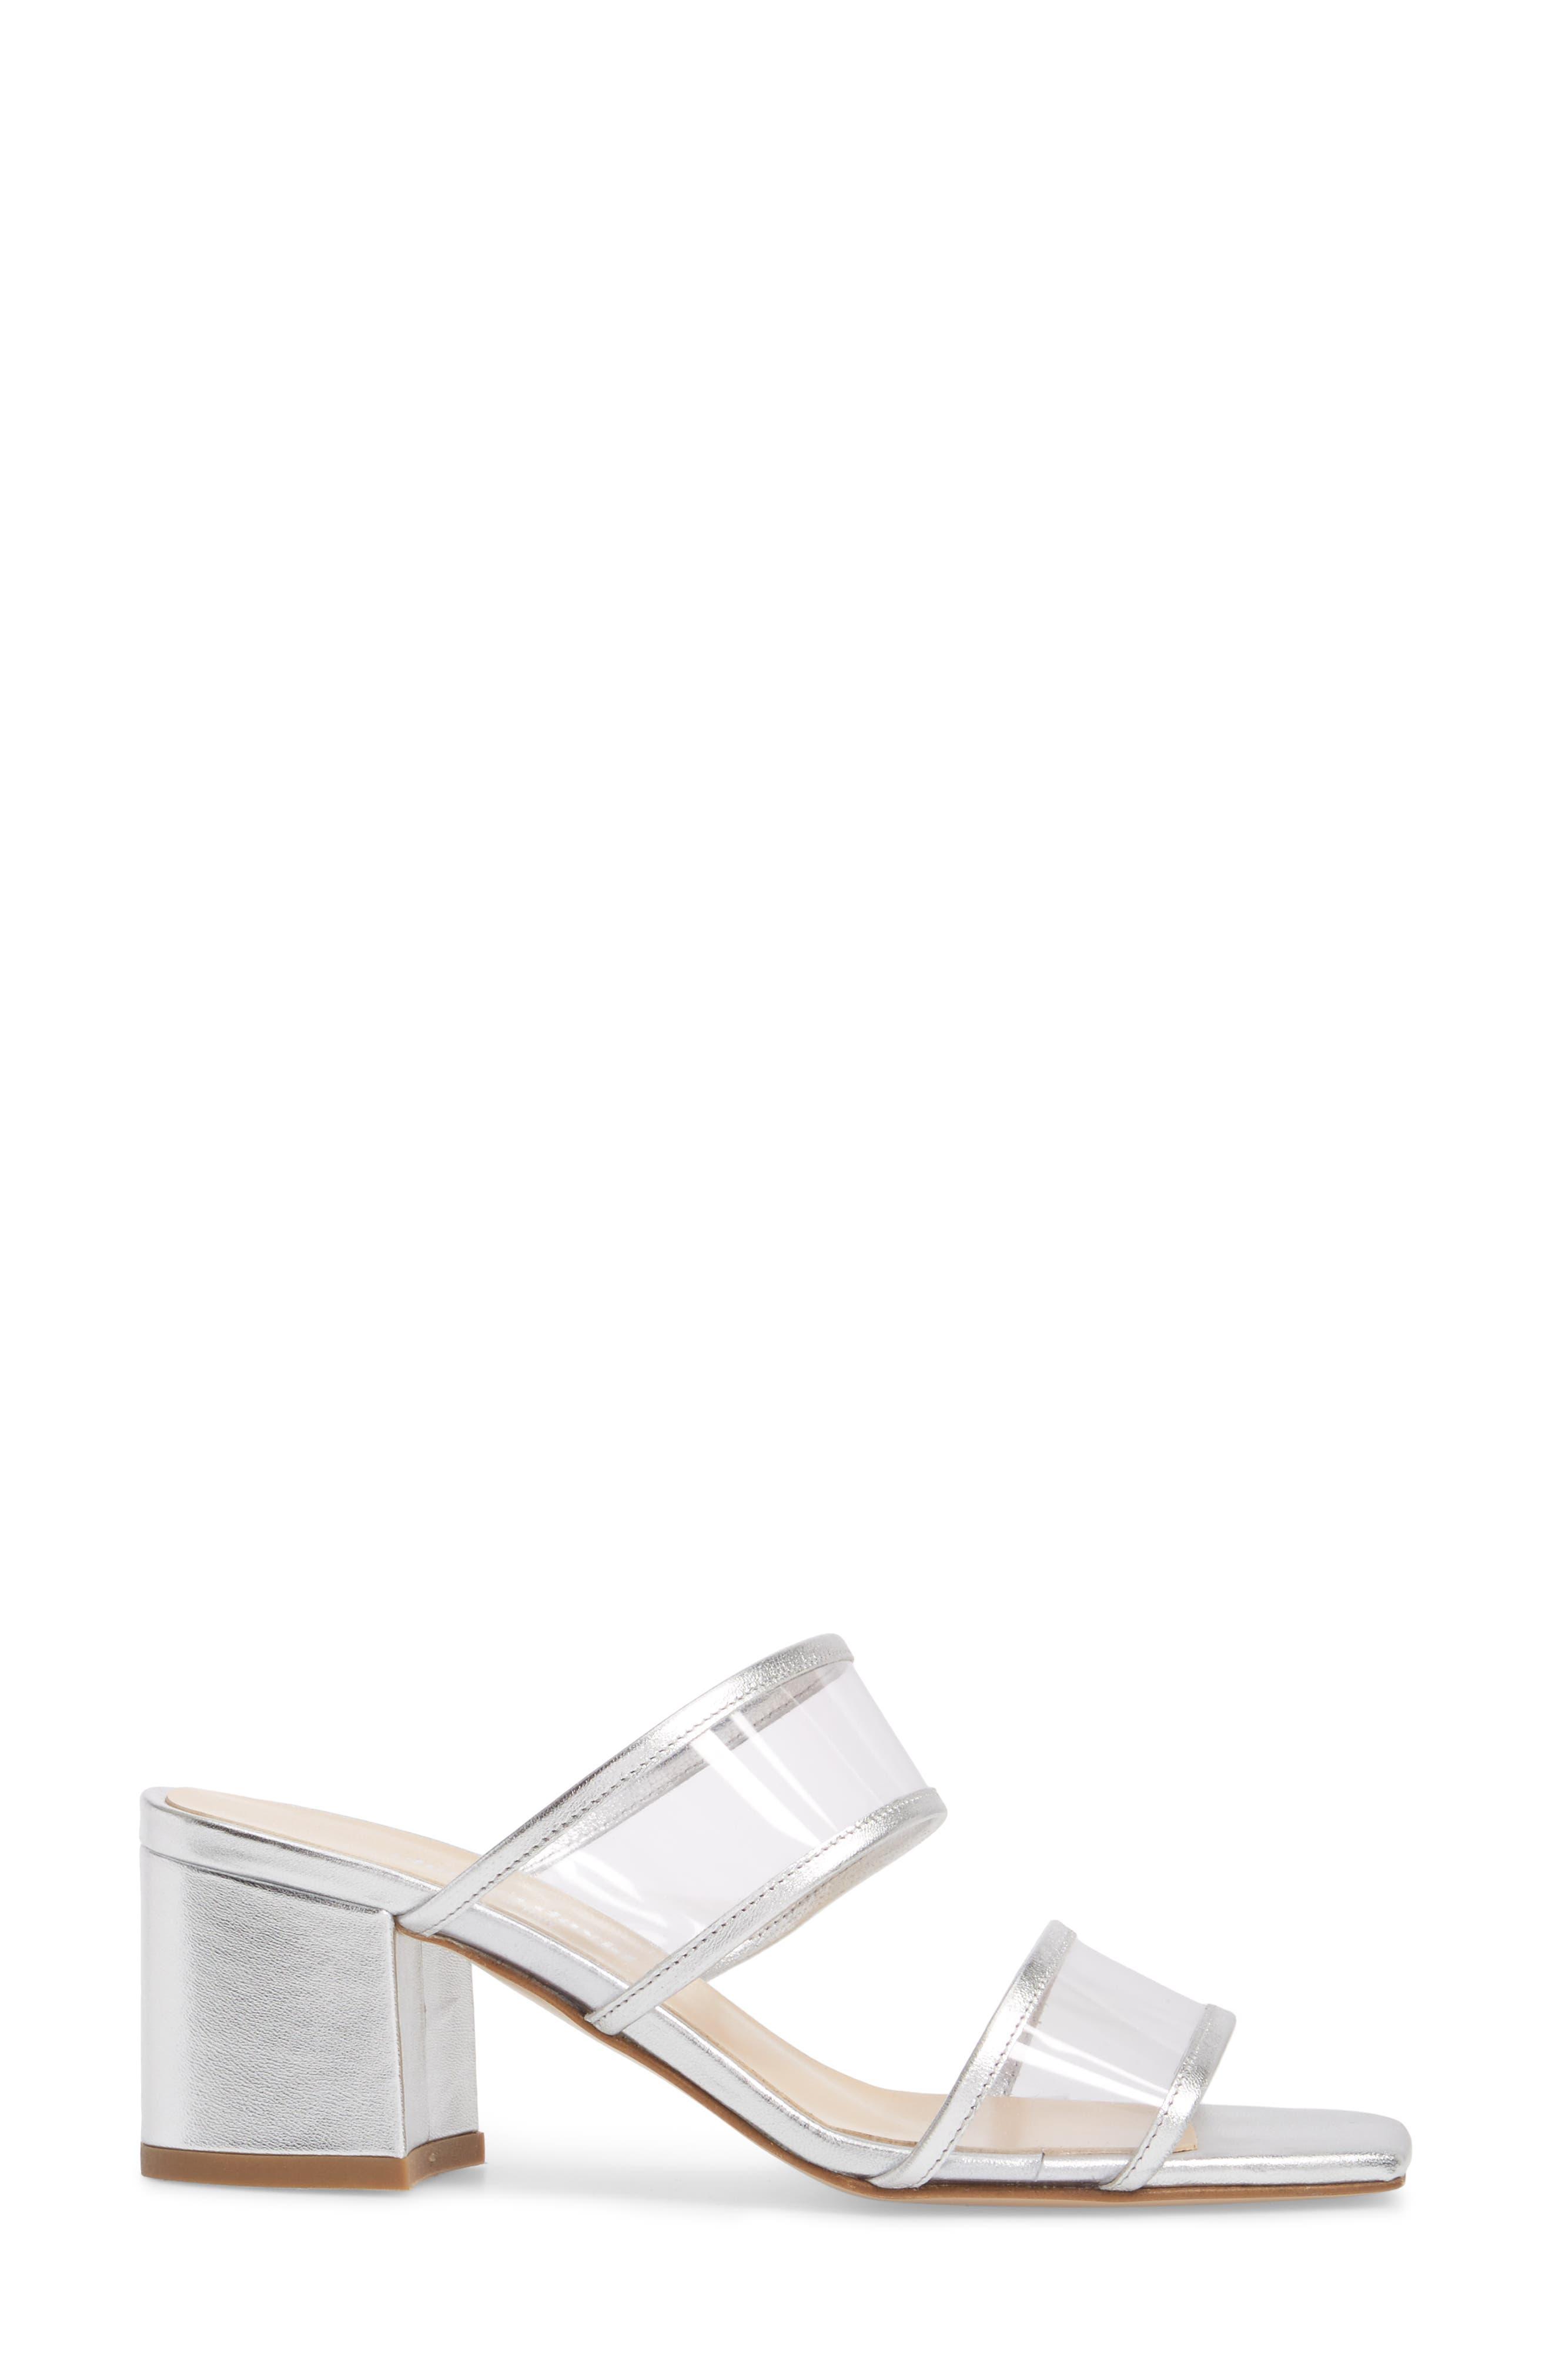 Cally Transparent Strap Slide Sandal,                             Alternate thumbnail 3, color,                             Silver